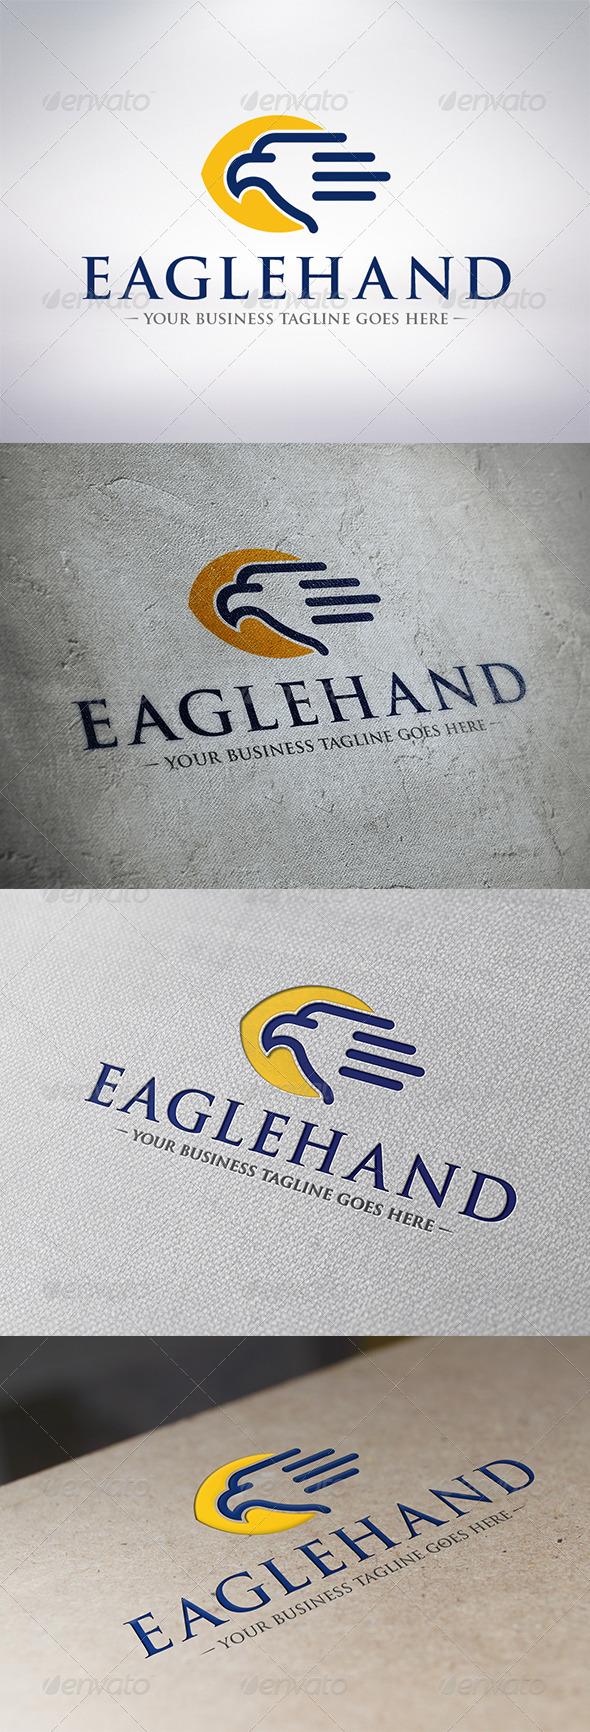 Eagle Hand Logo Template - Animals Logo Templates